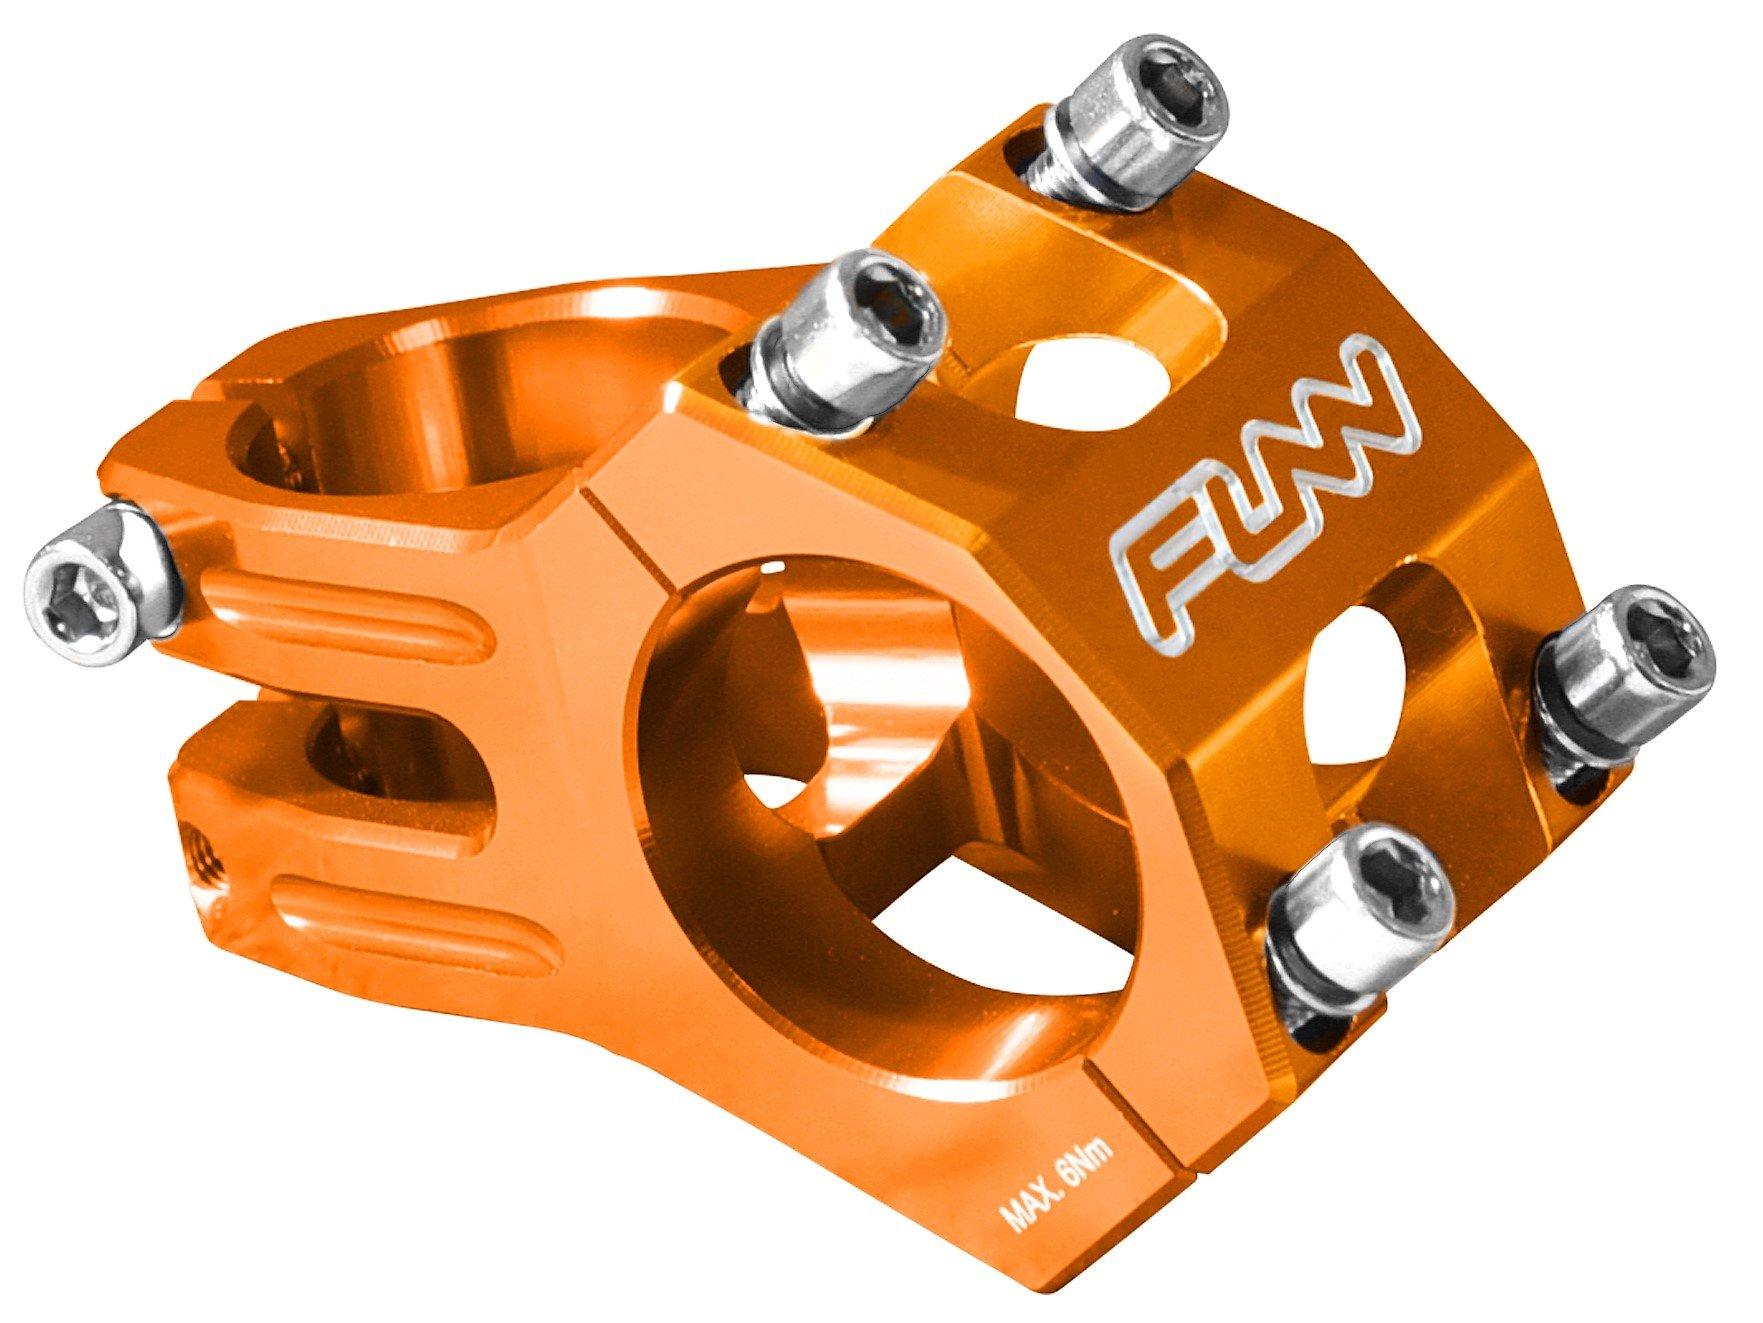 Funn Funnduro MTB Stem, Bar Clamp 31.8mm (Length 45mm, Orange) by Funn